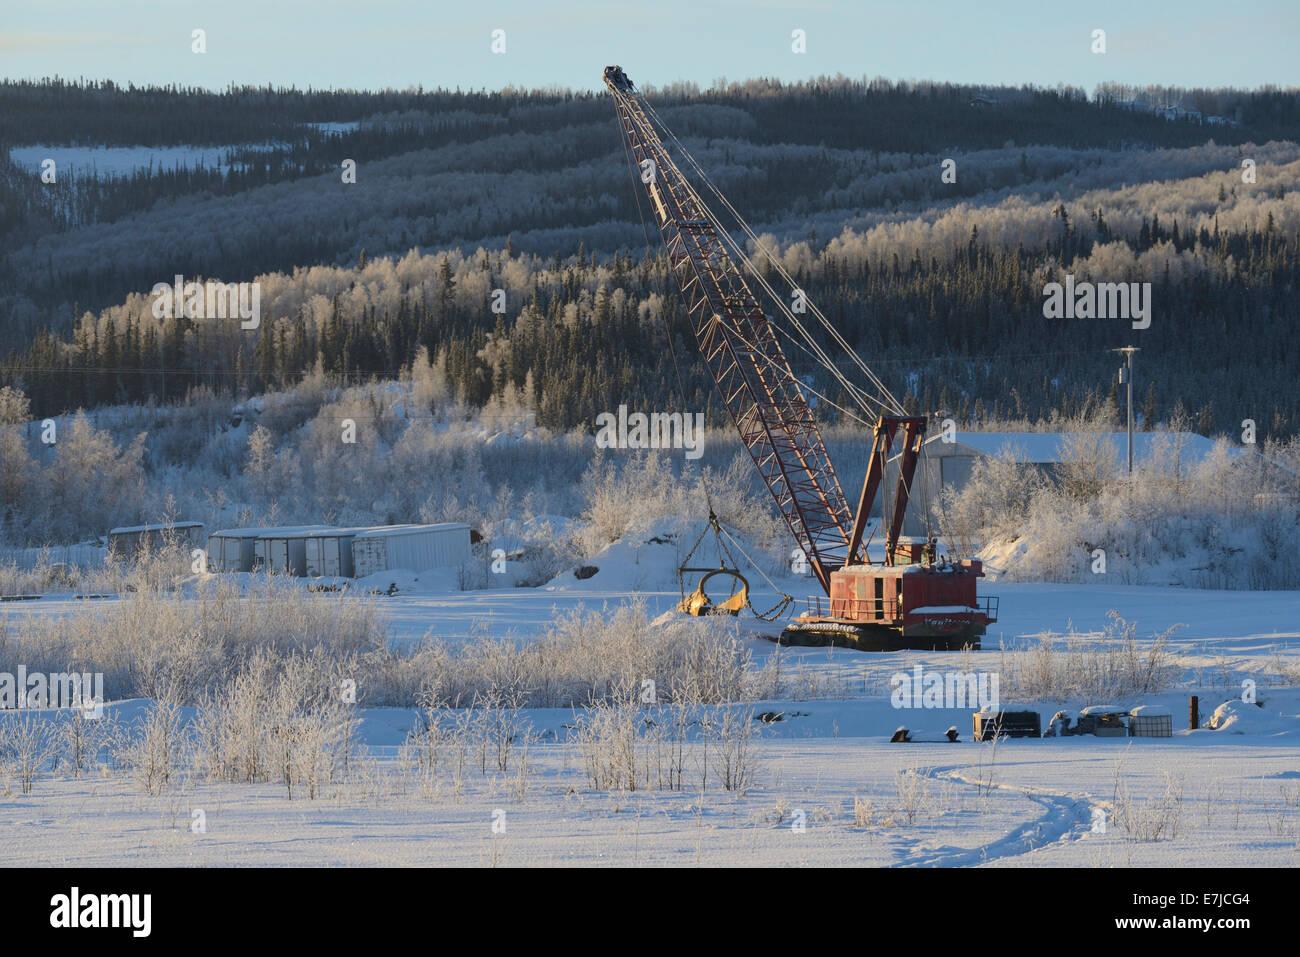 USA, United States, America, Alaska, Fairbanks, Far north, gold rush, mining, crane - Stock Image